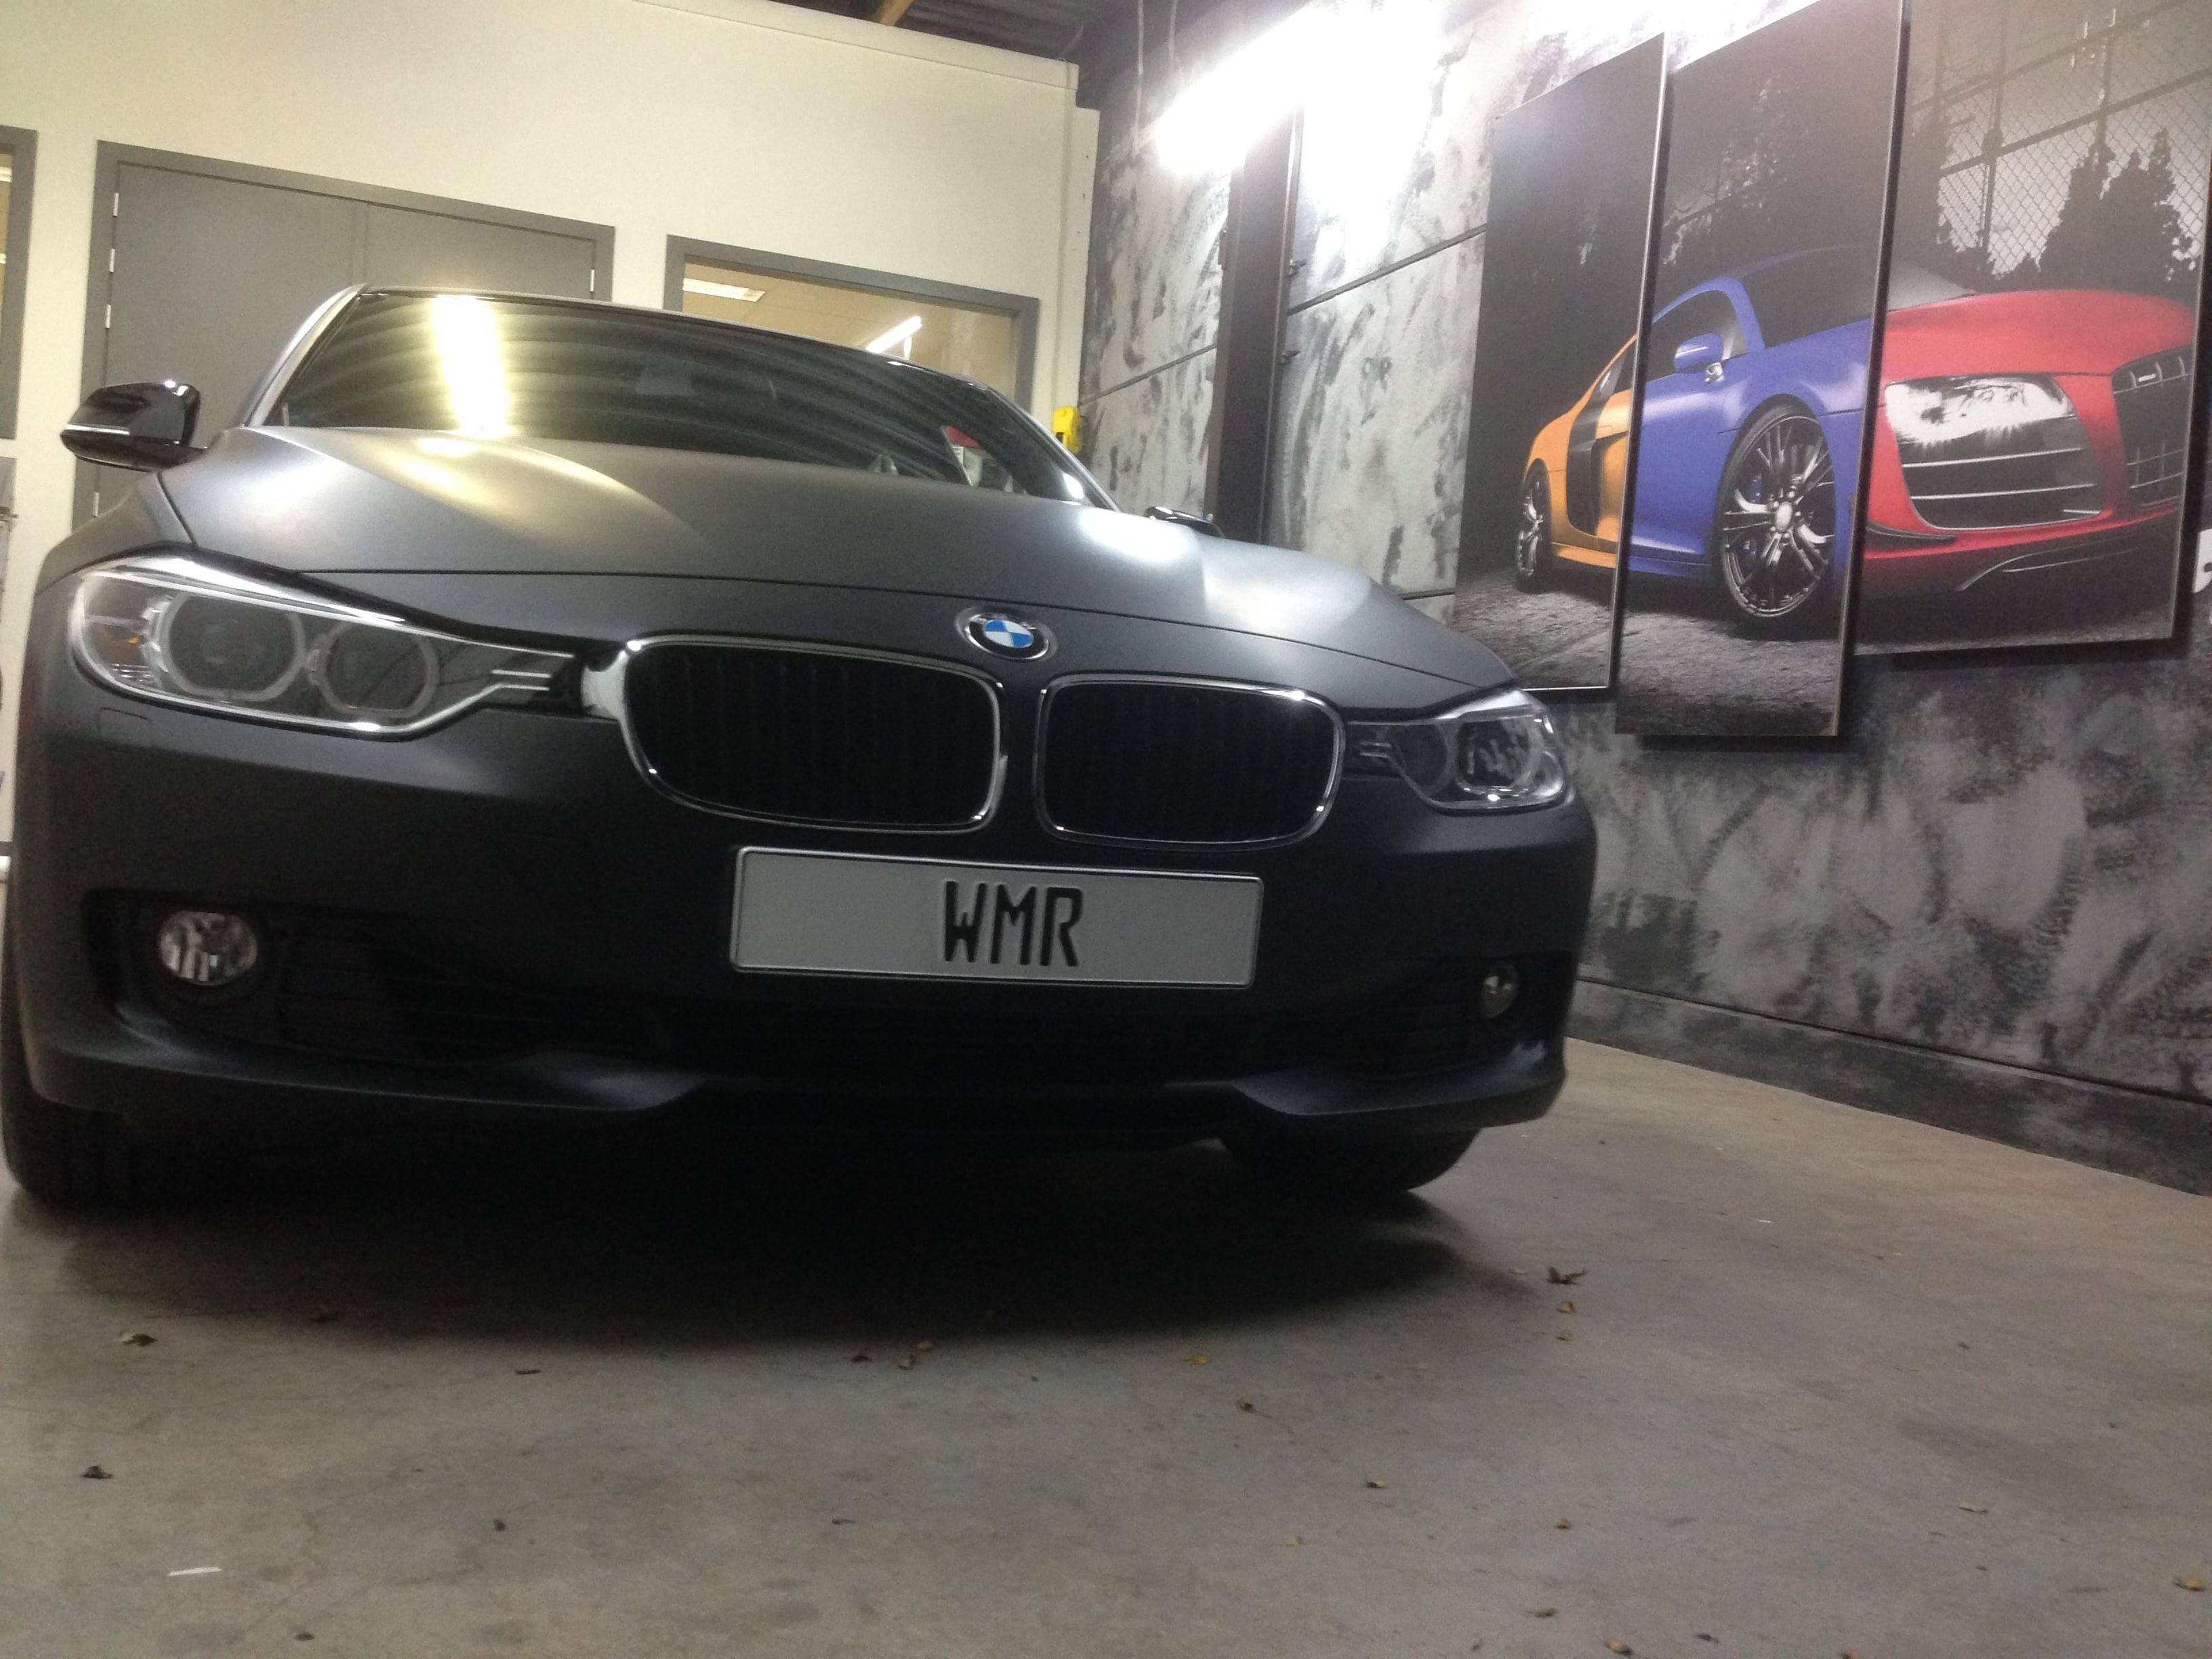 BMW E92 3 Serie met Mat Zwarte Wrap, Carwrapping door Wrapmyride.nu Foto-nr:5420, ©2020